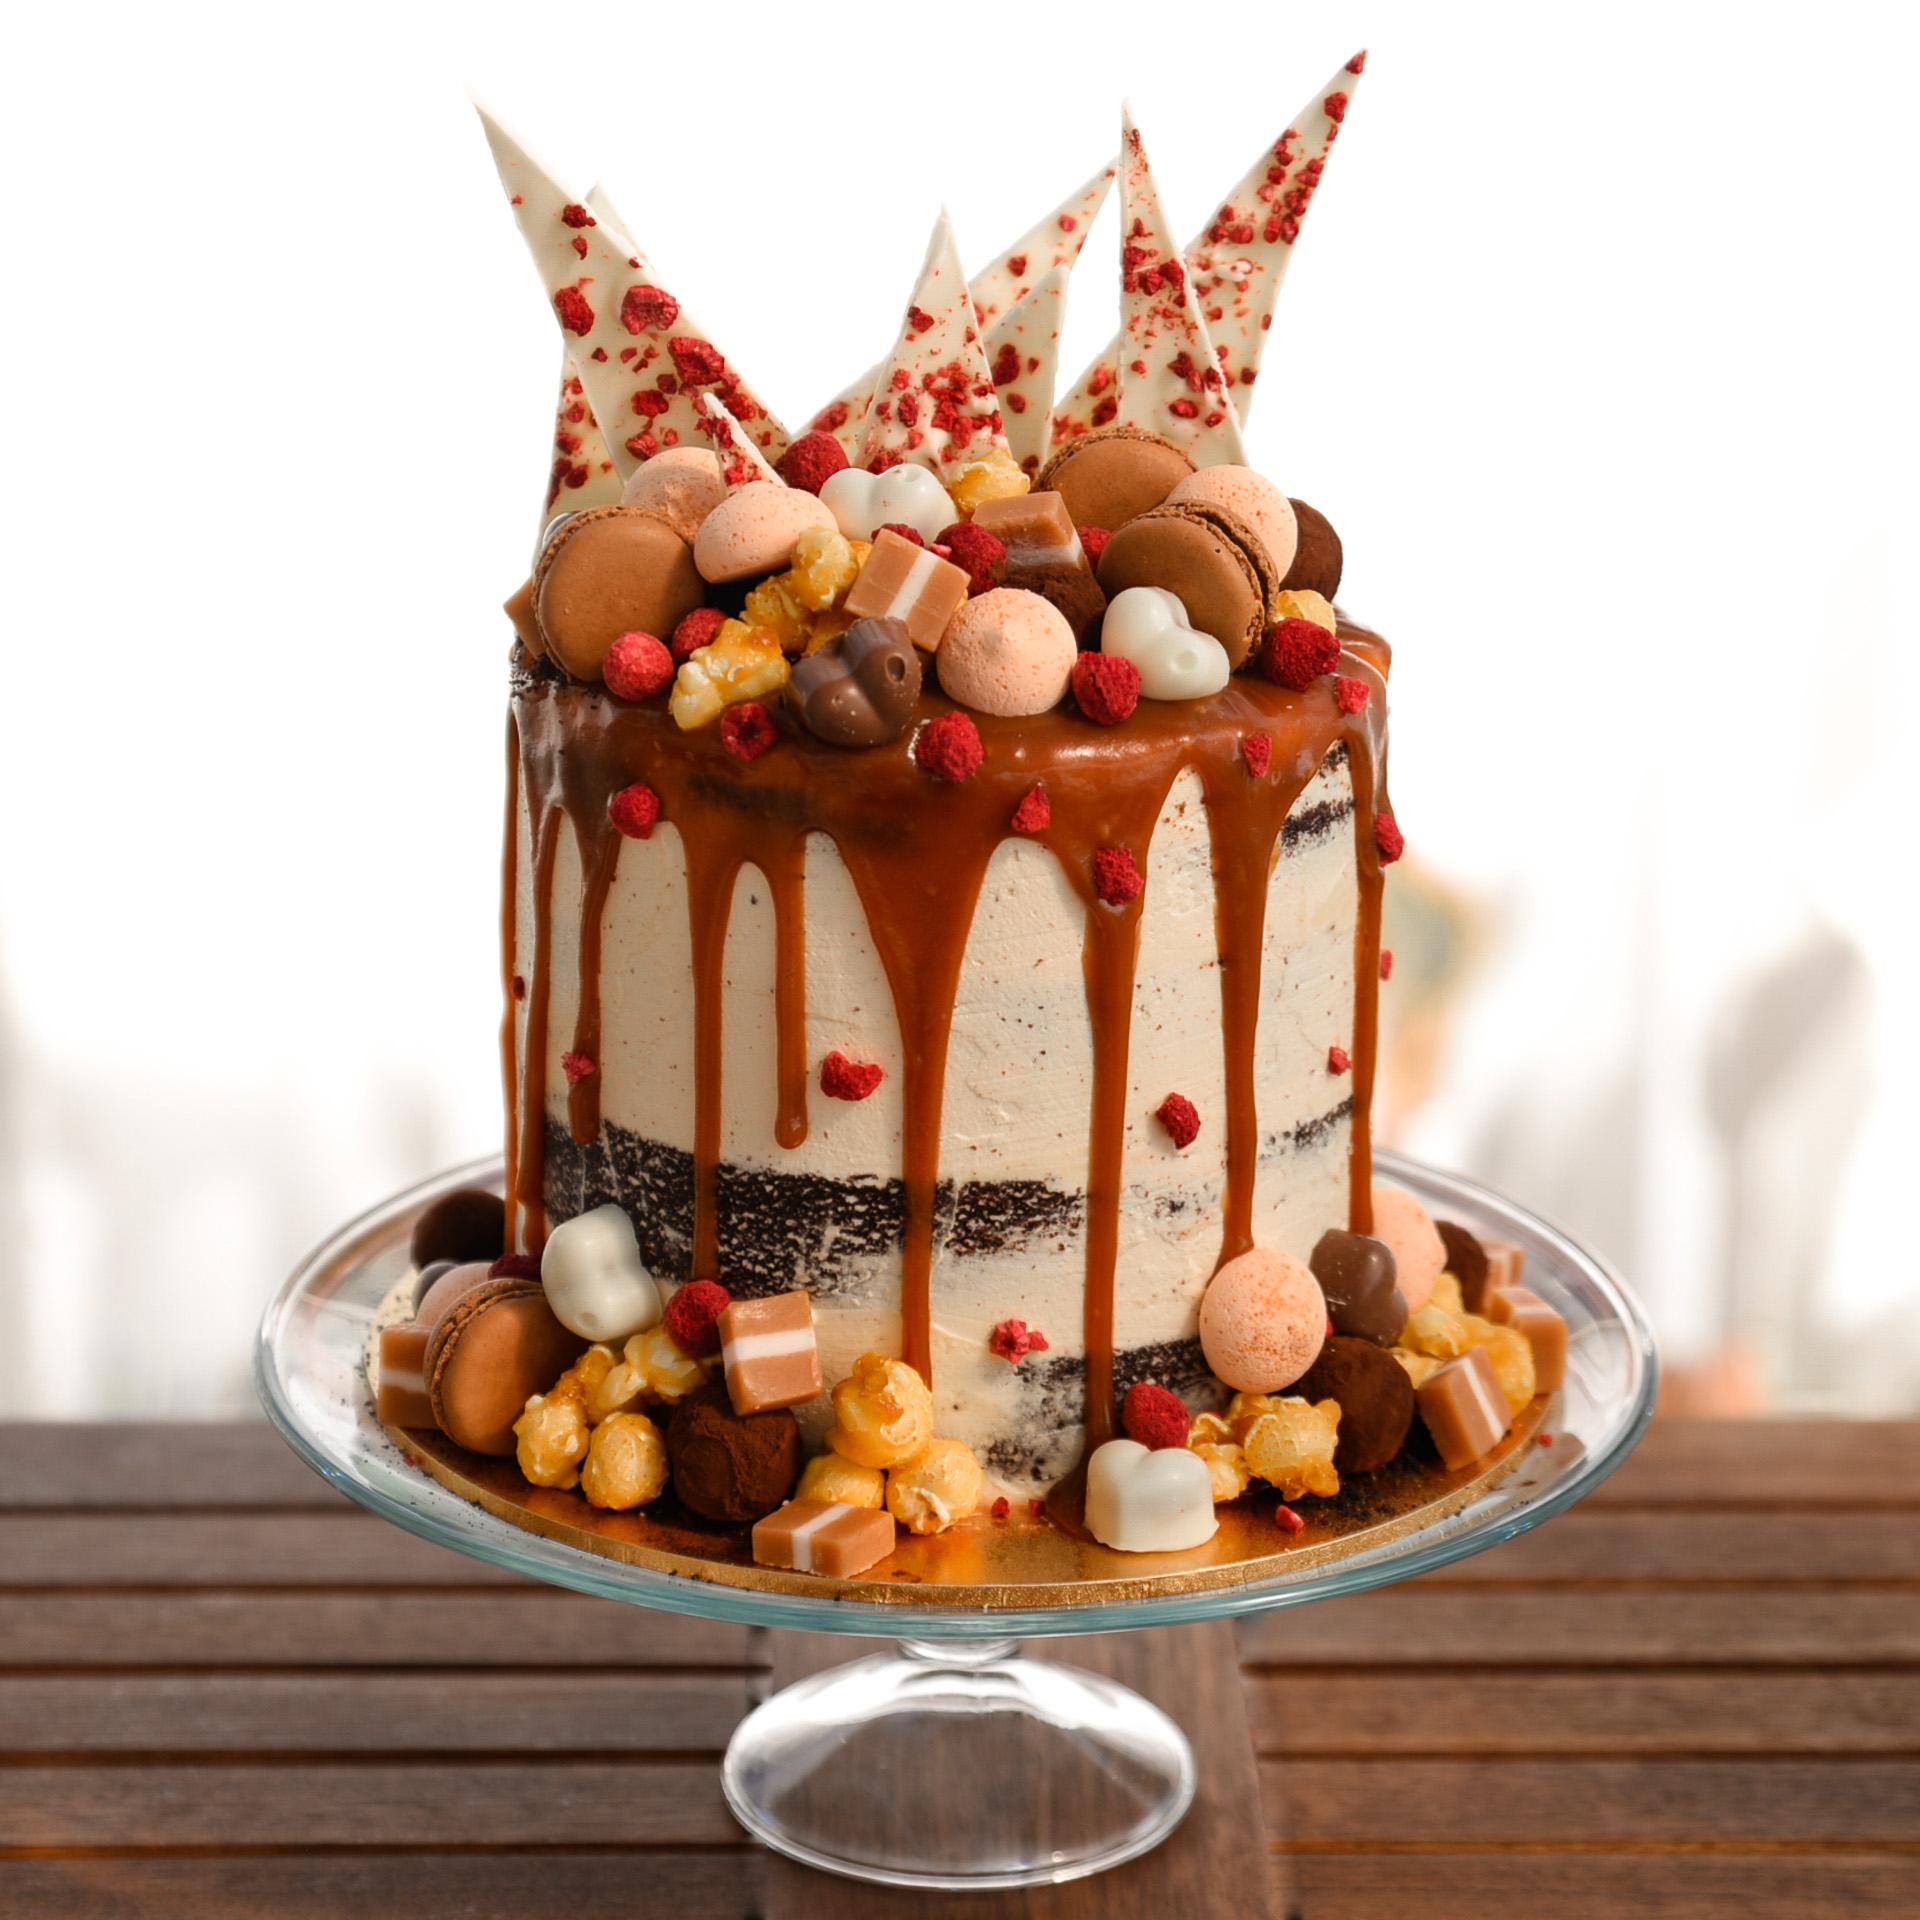 Semi-Scraped-Fully-Loaded-Drip-Cake.jpg